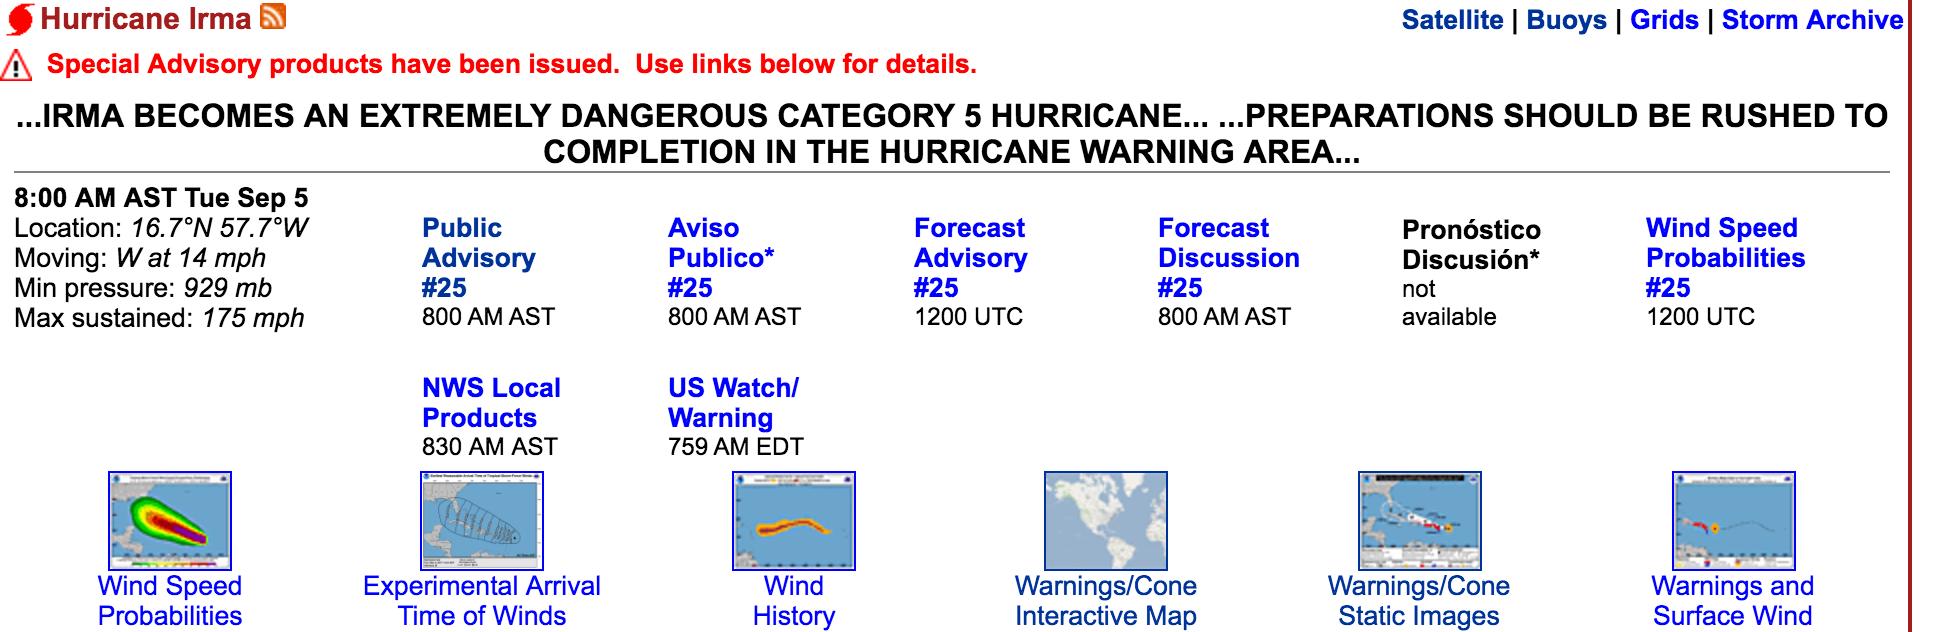 Treasure Coast Hurricane Shelters